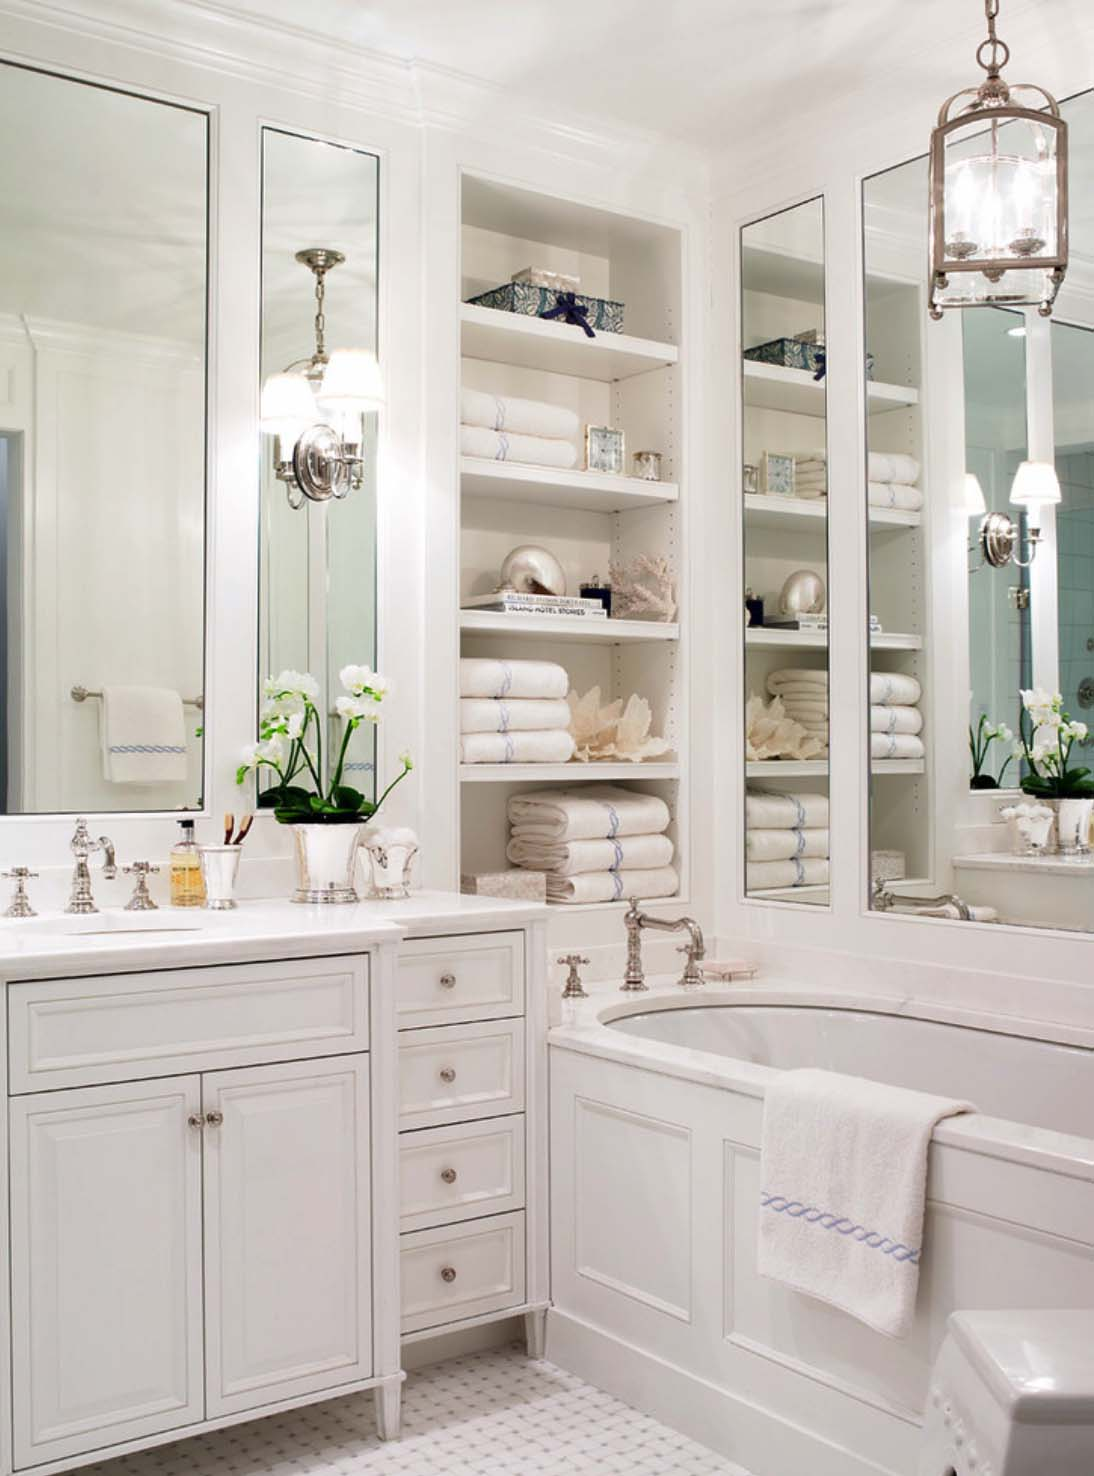 Classic Style Bathroom Design photo - 8